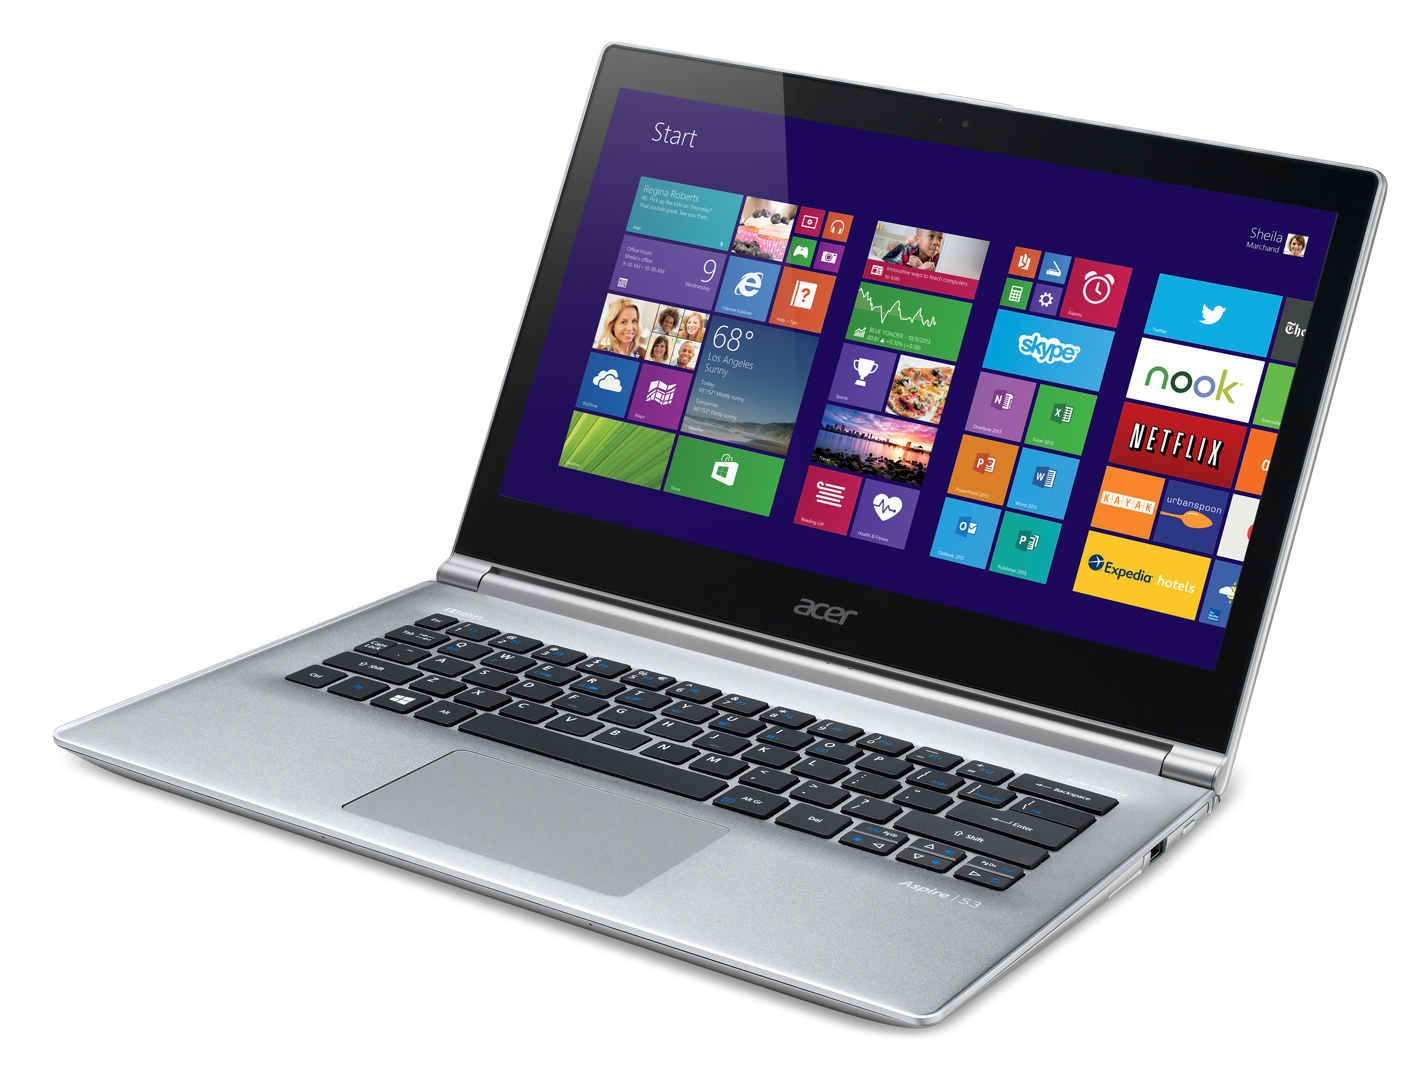 Ноутбук Dell XPS 13 9360-8944 (Intel Core i5-7200U 2.5 GHz/8192Mb/256Gb SSD/No ODD/Intel HD Graphics/Wi-Fi/Bluetooth/Cam/13.3/1920x1080/Linux)